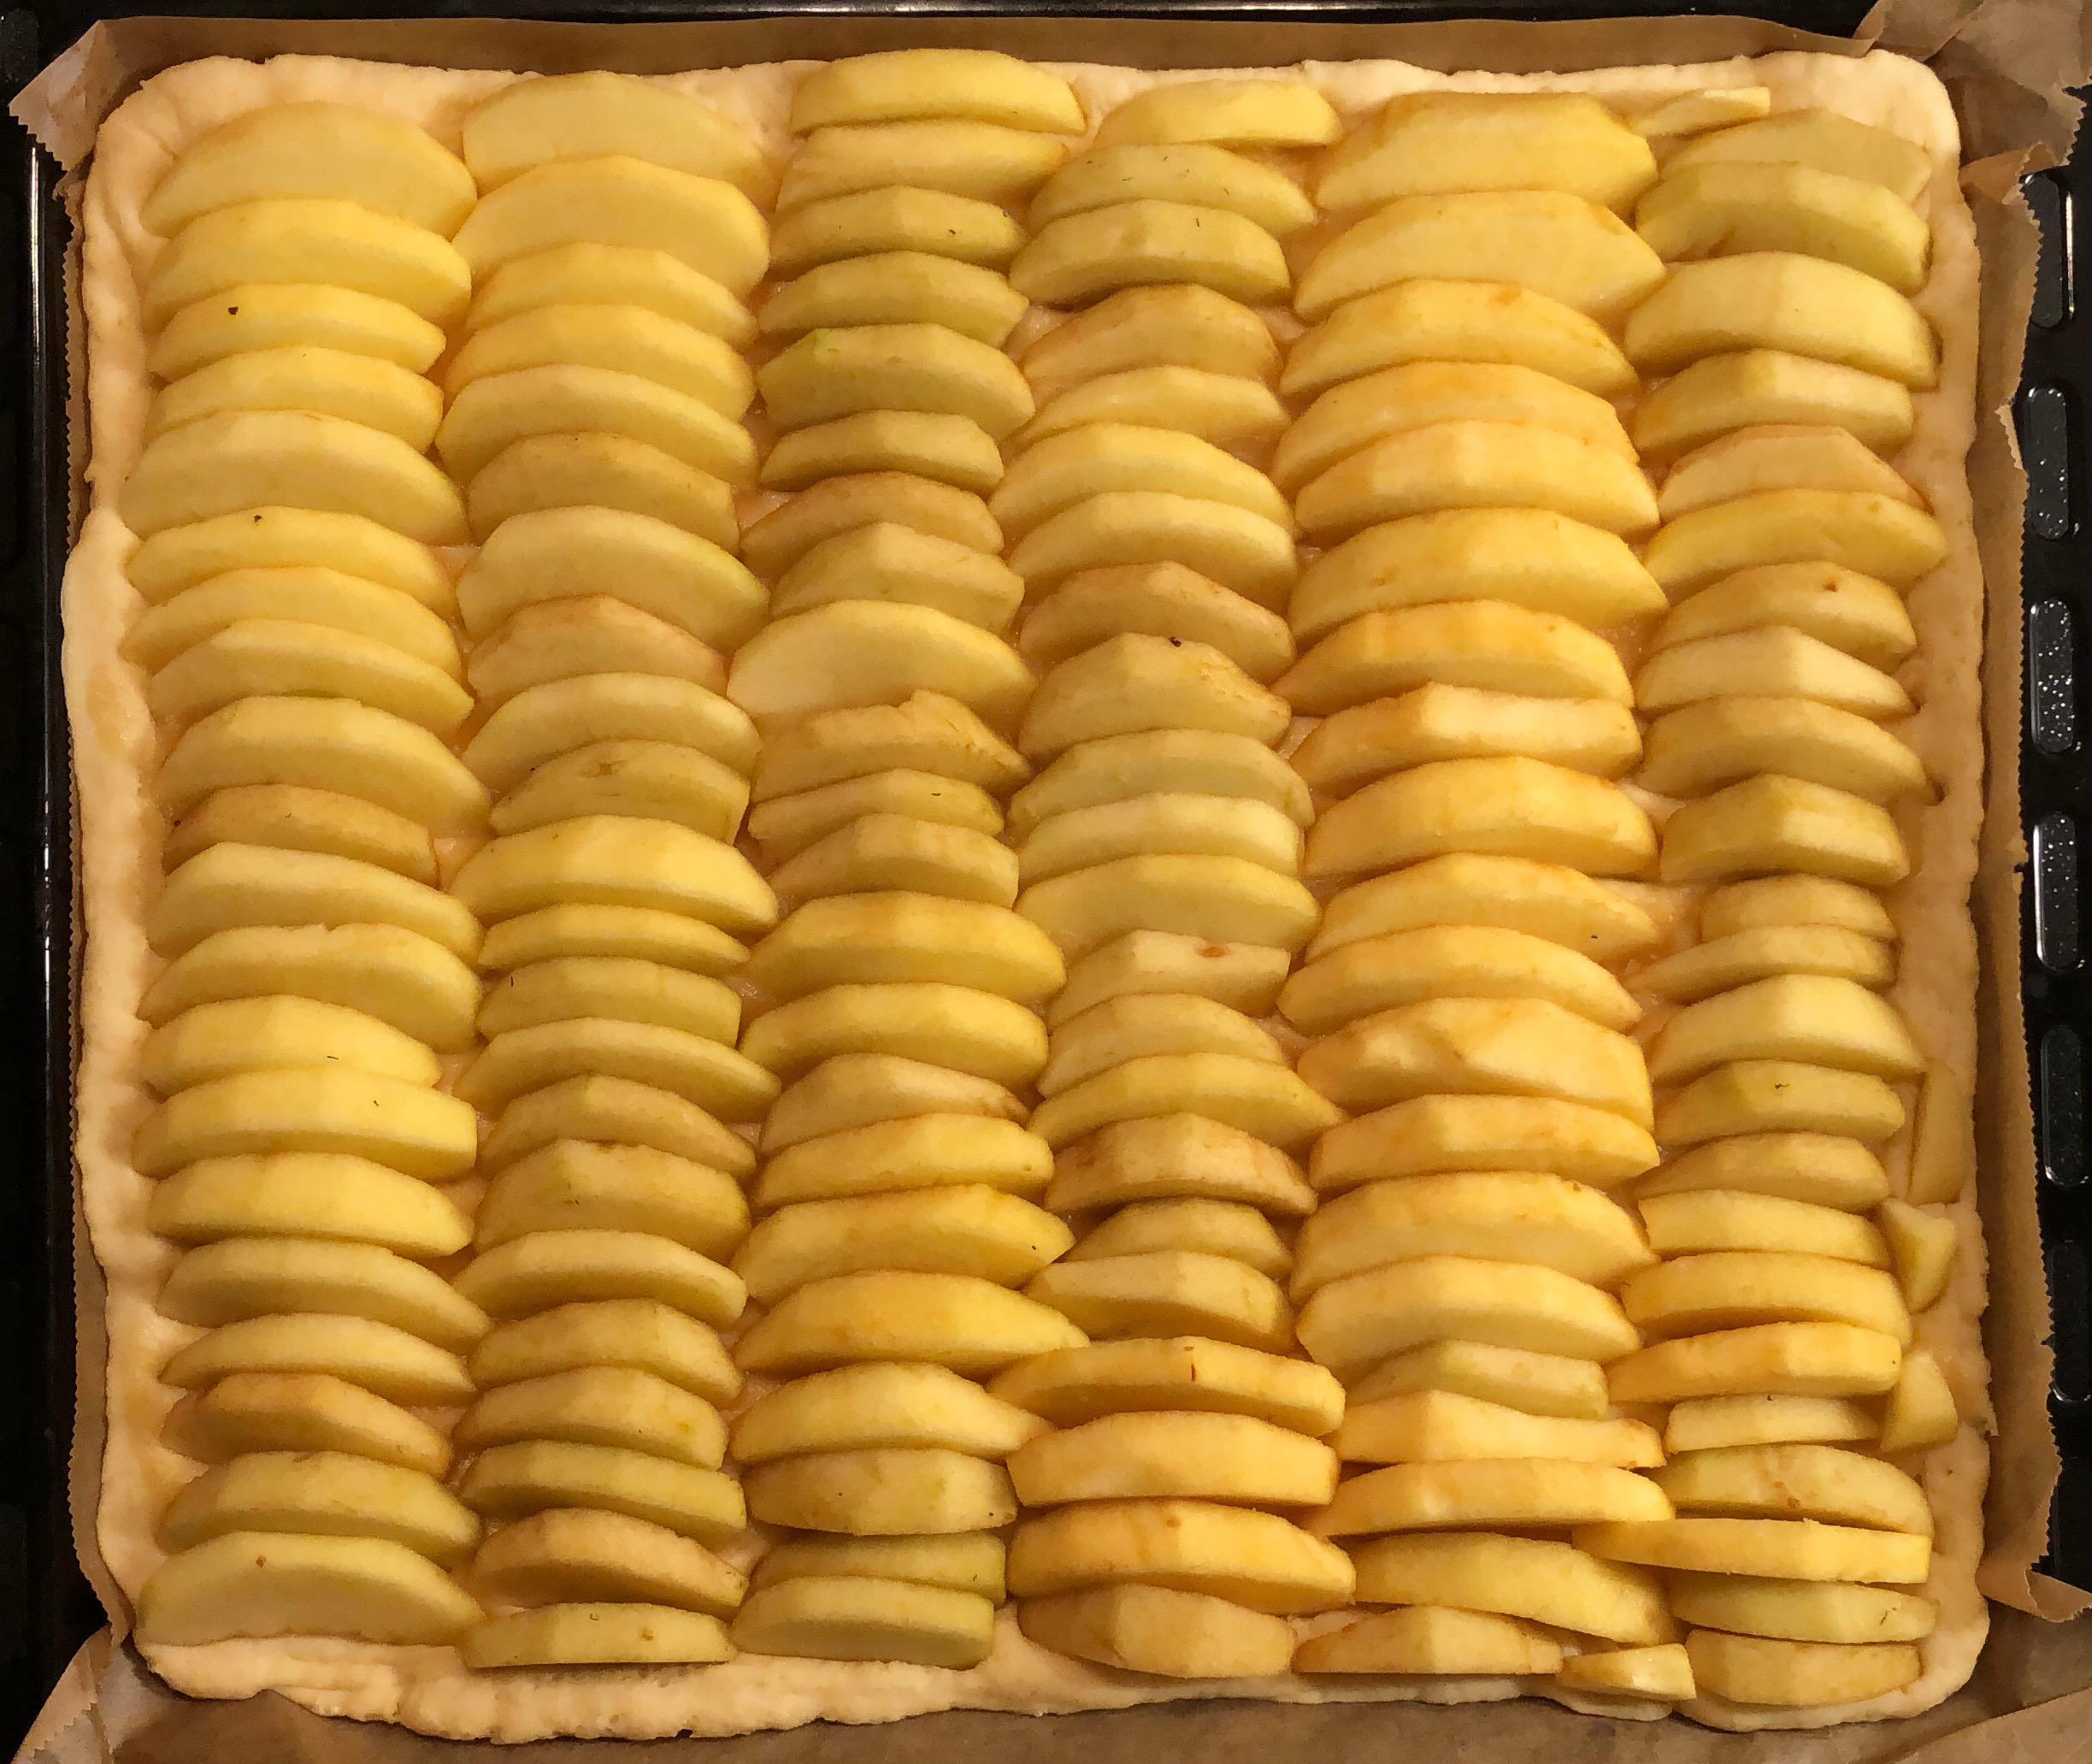 Apfelkuchenblech ohne Streusel